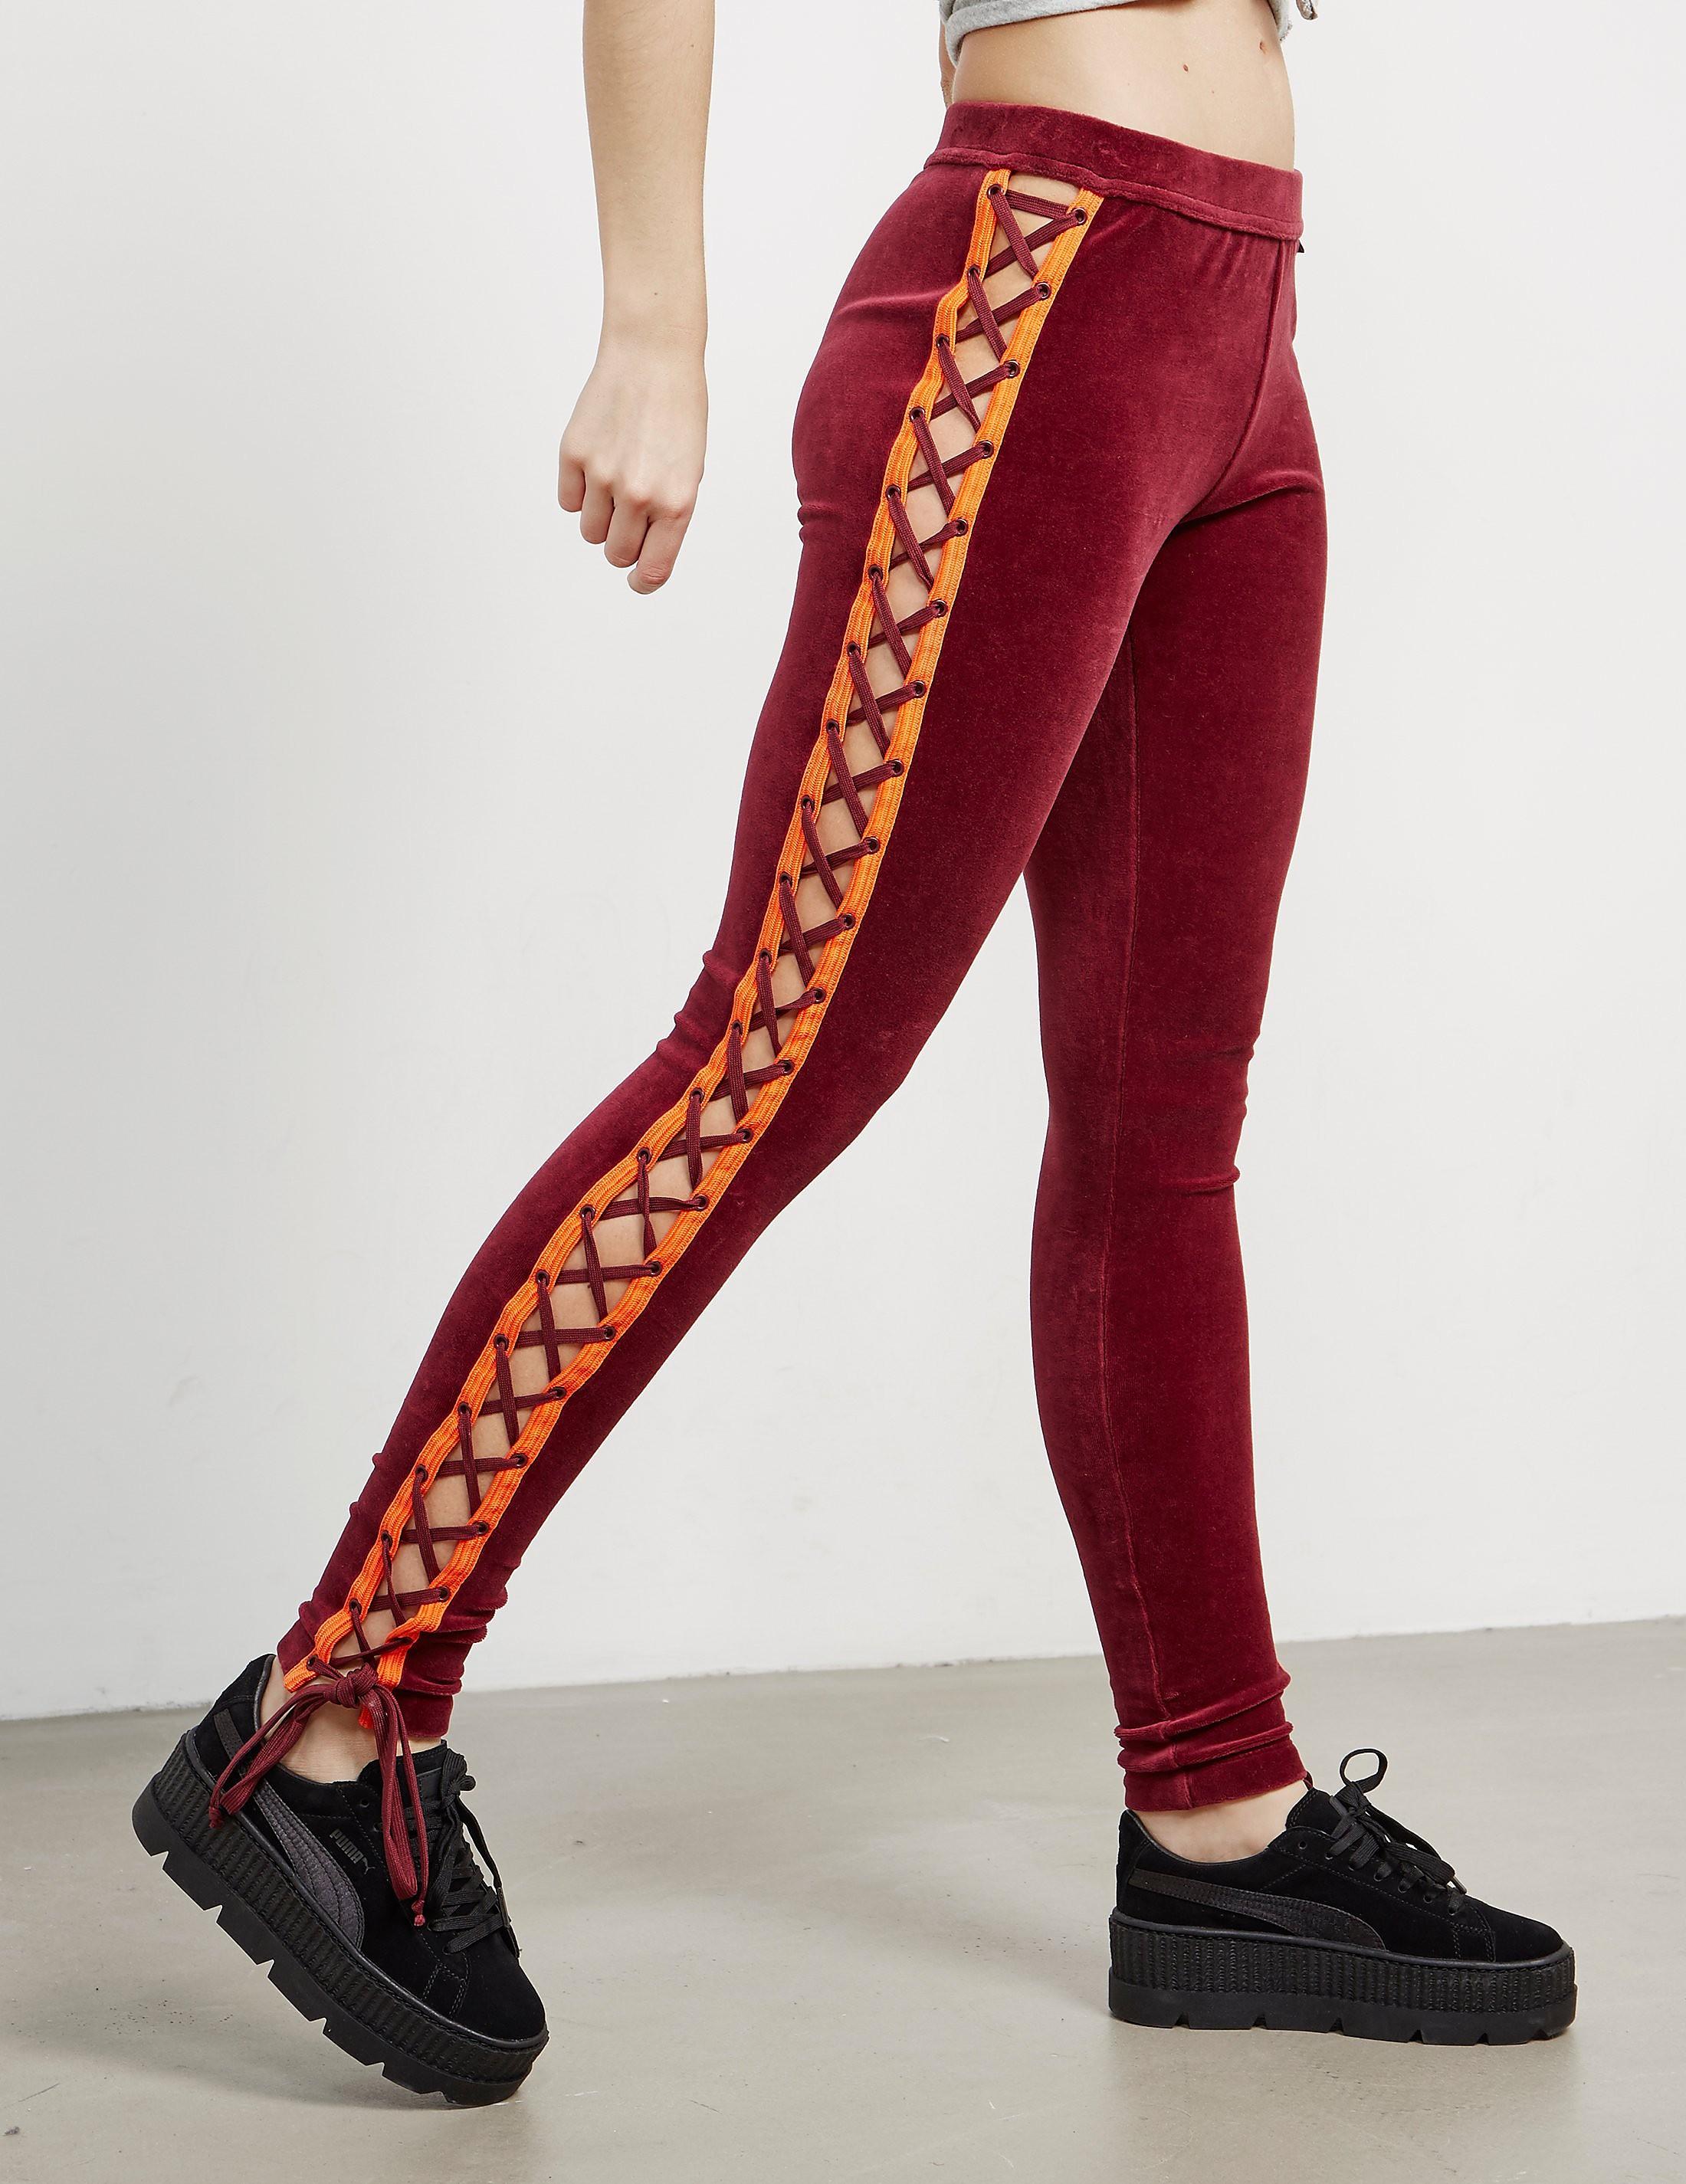 PUMA x Fenty Velour Leggings